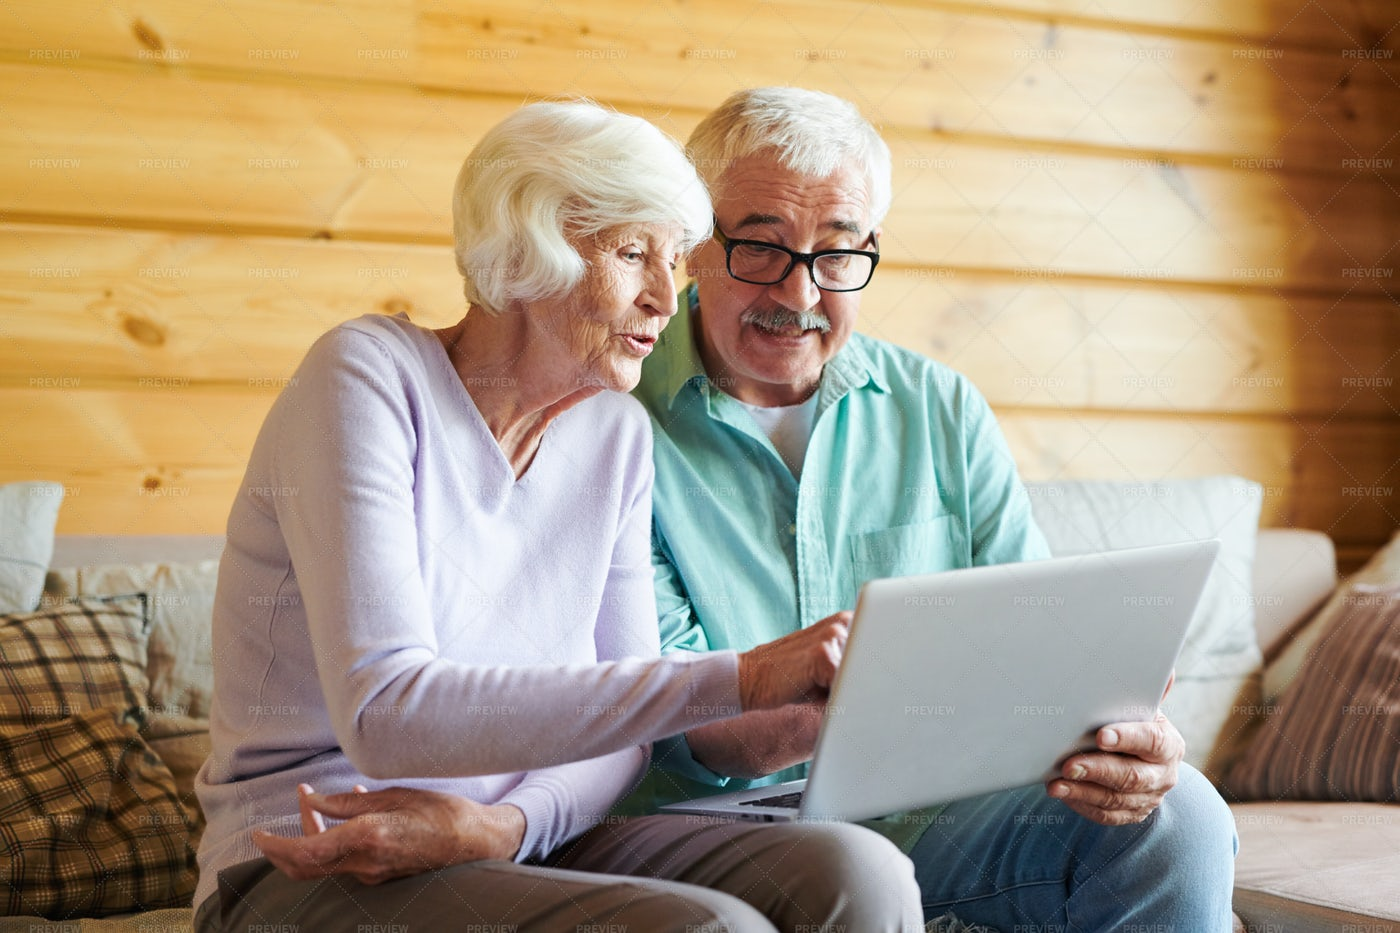 Seniors In The Net: Stock Photos